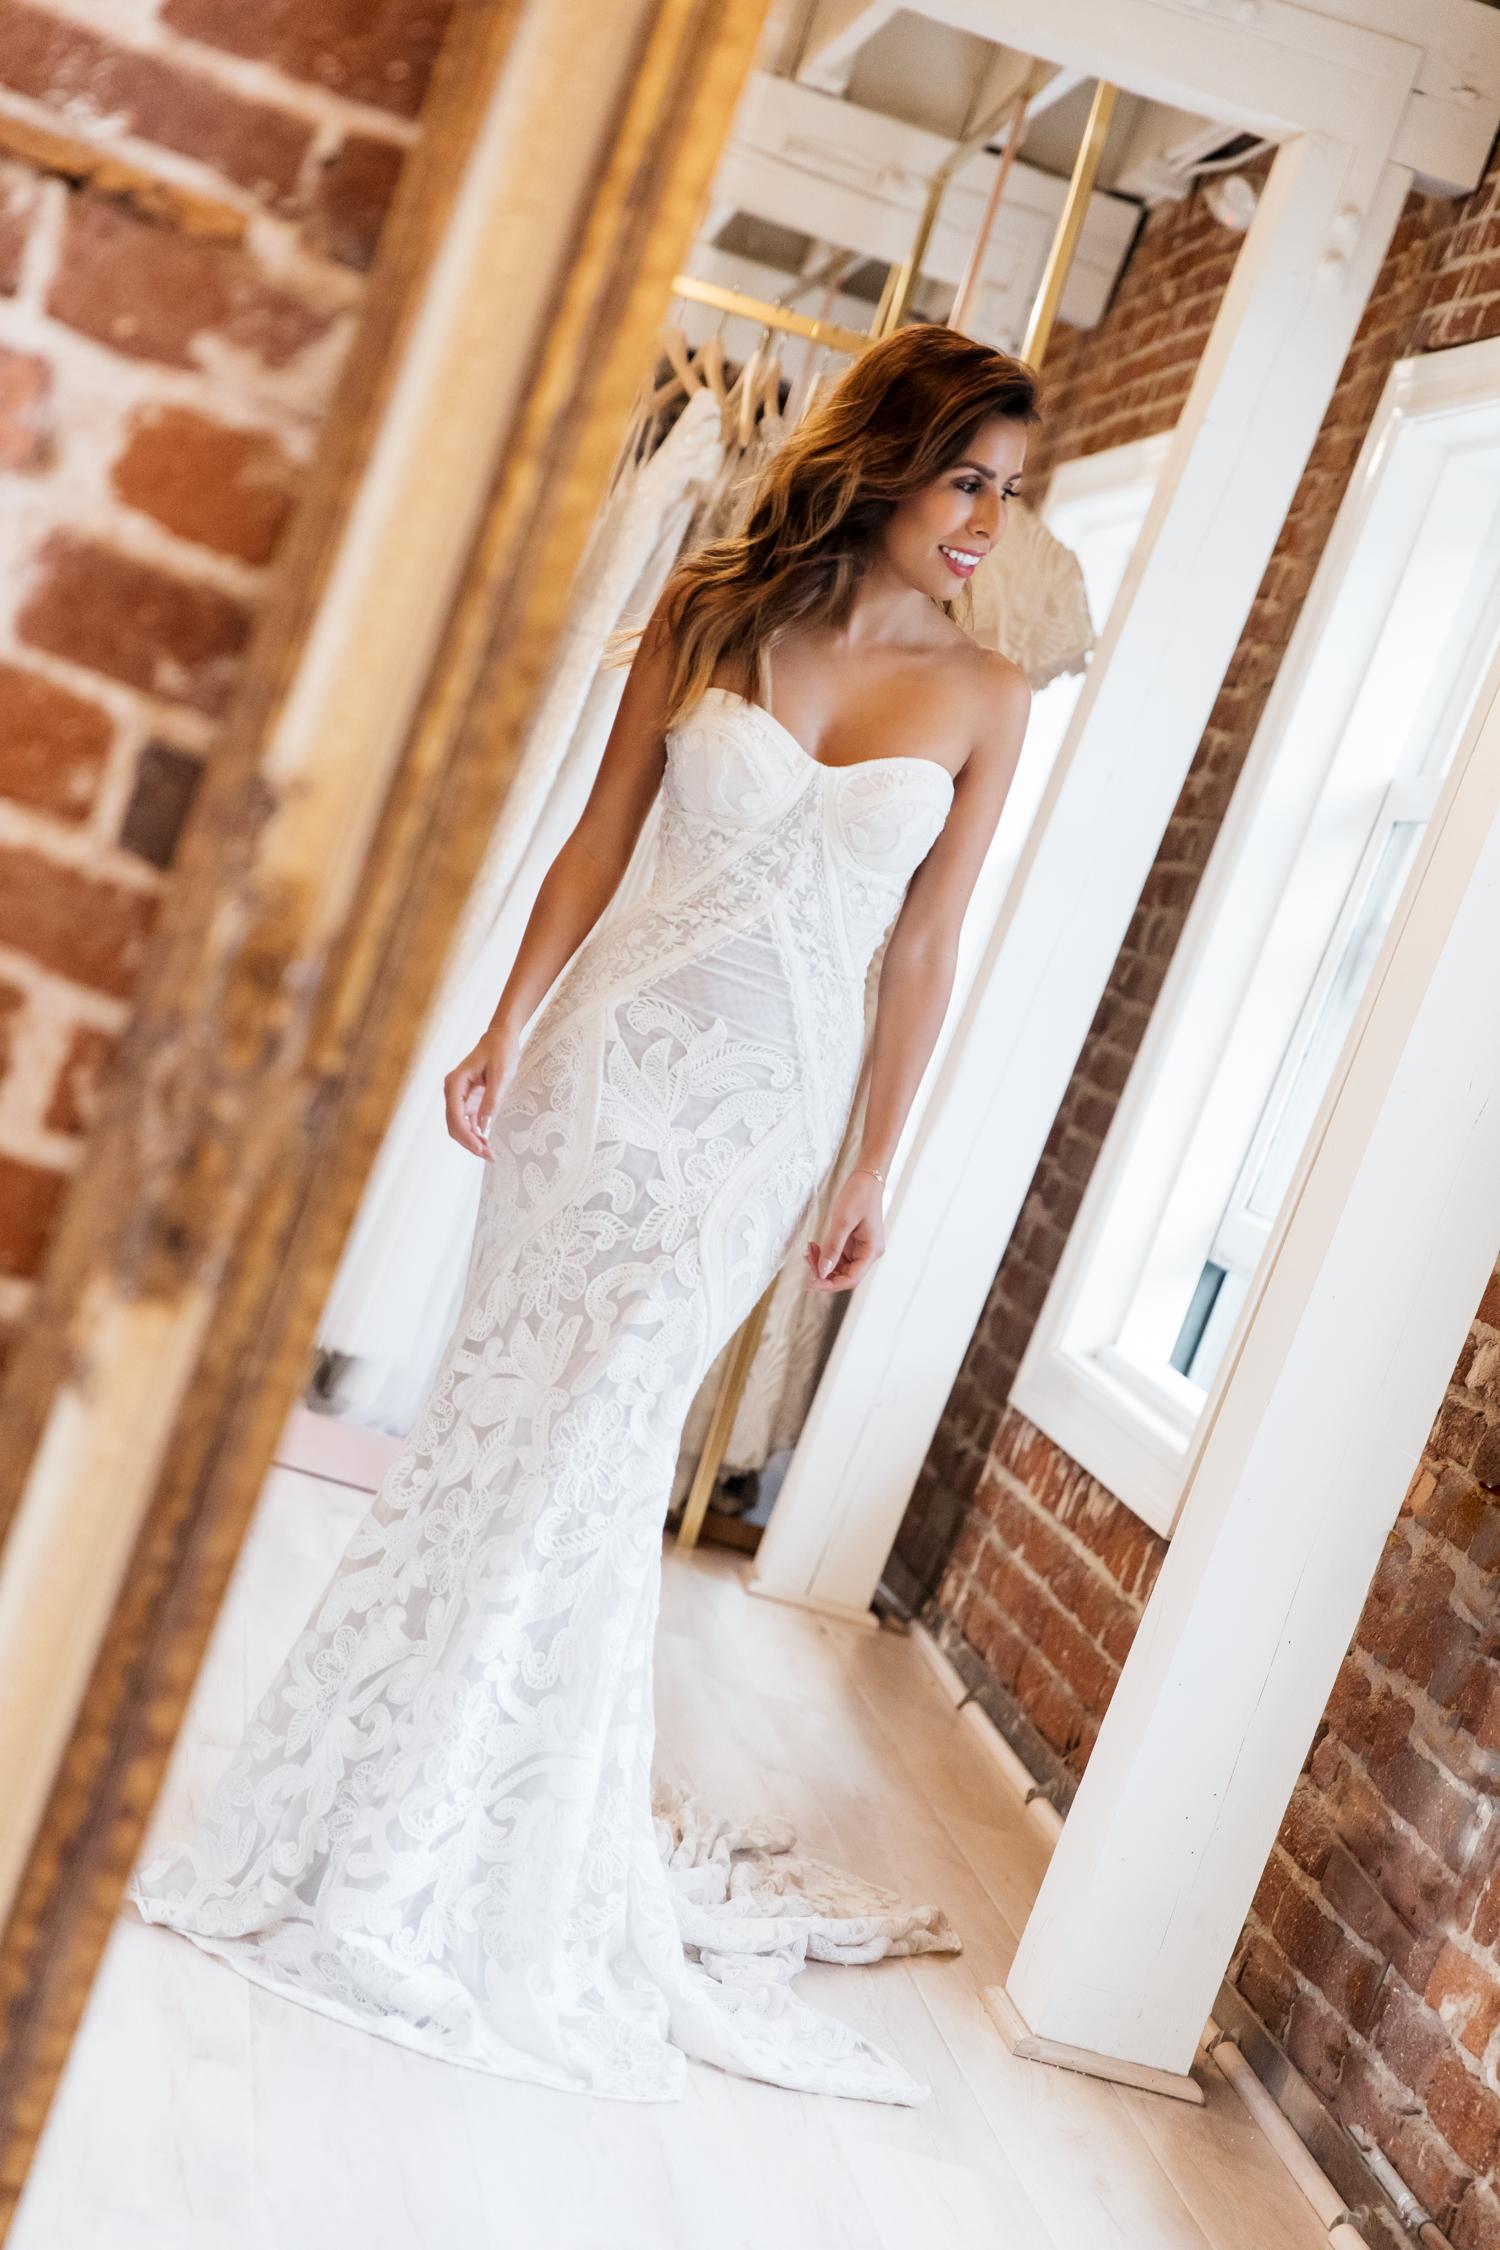 Strapless modern lace wedding gown by Rue De Seine - Lovely Bride Los Angeles